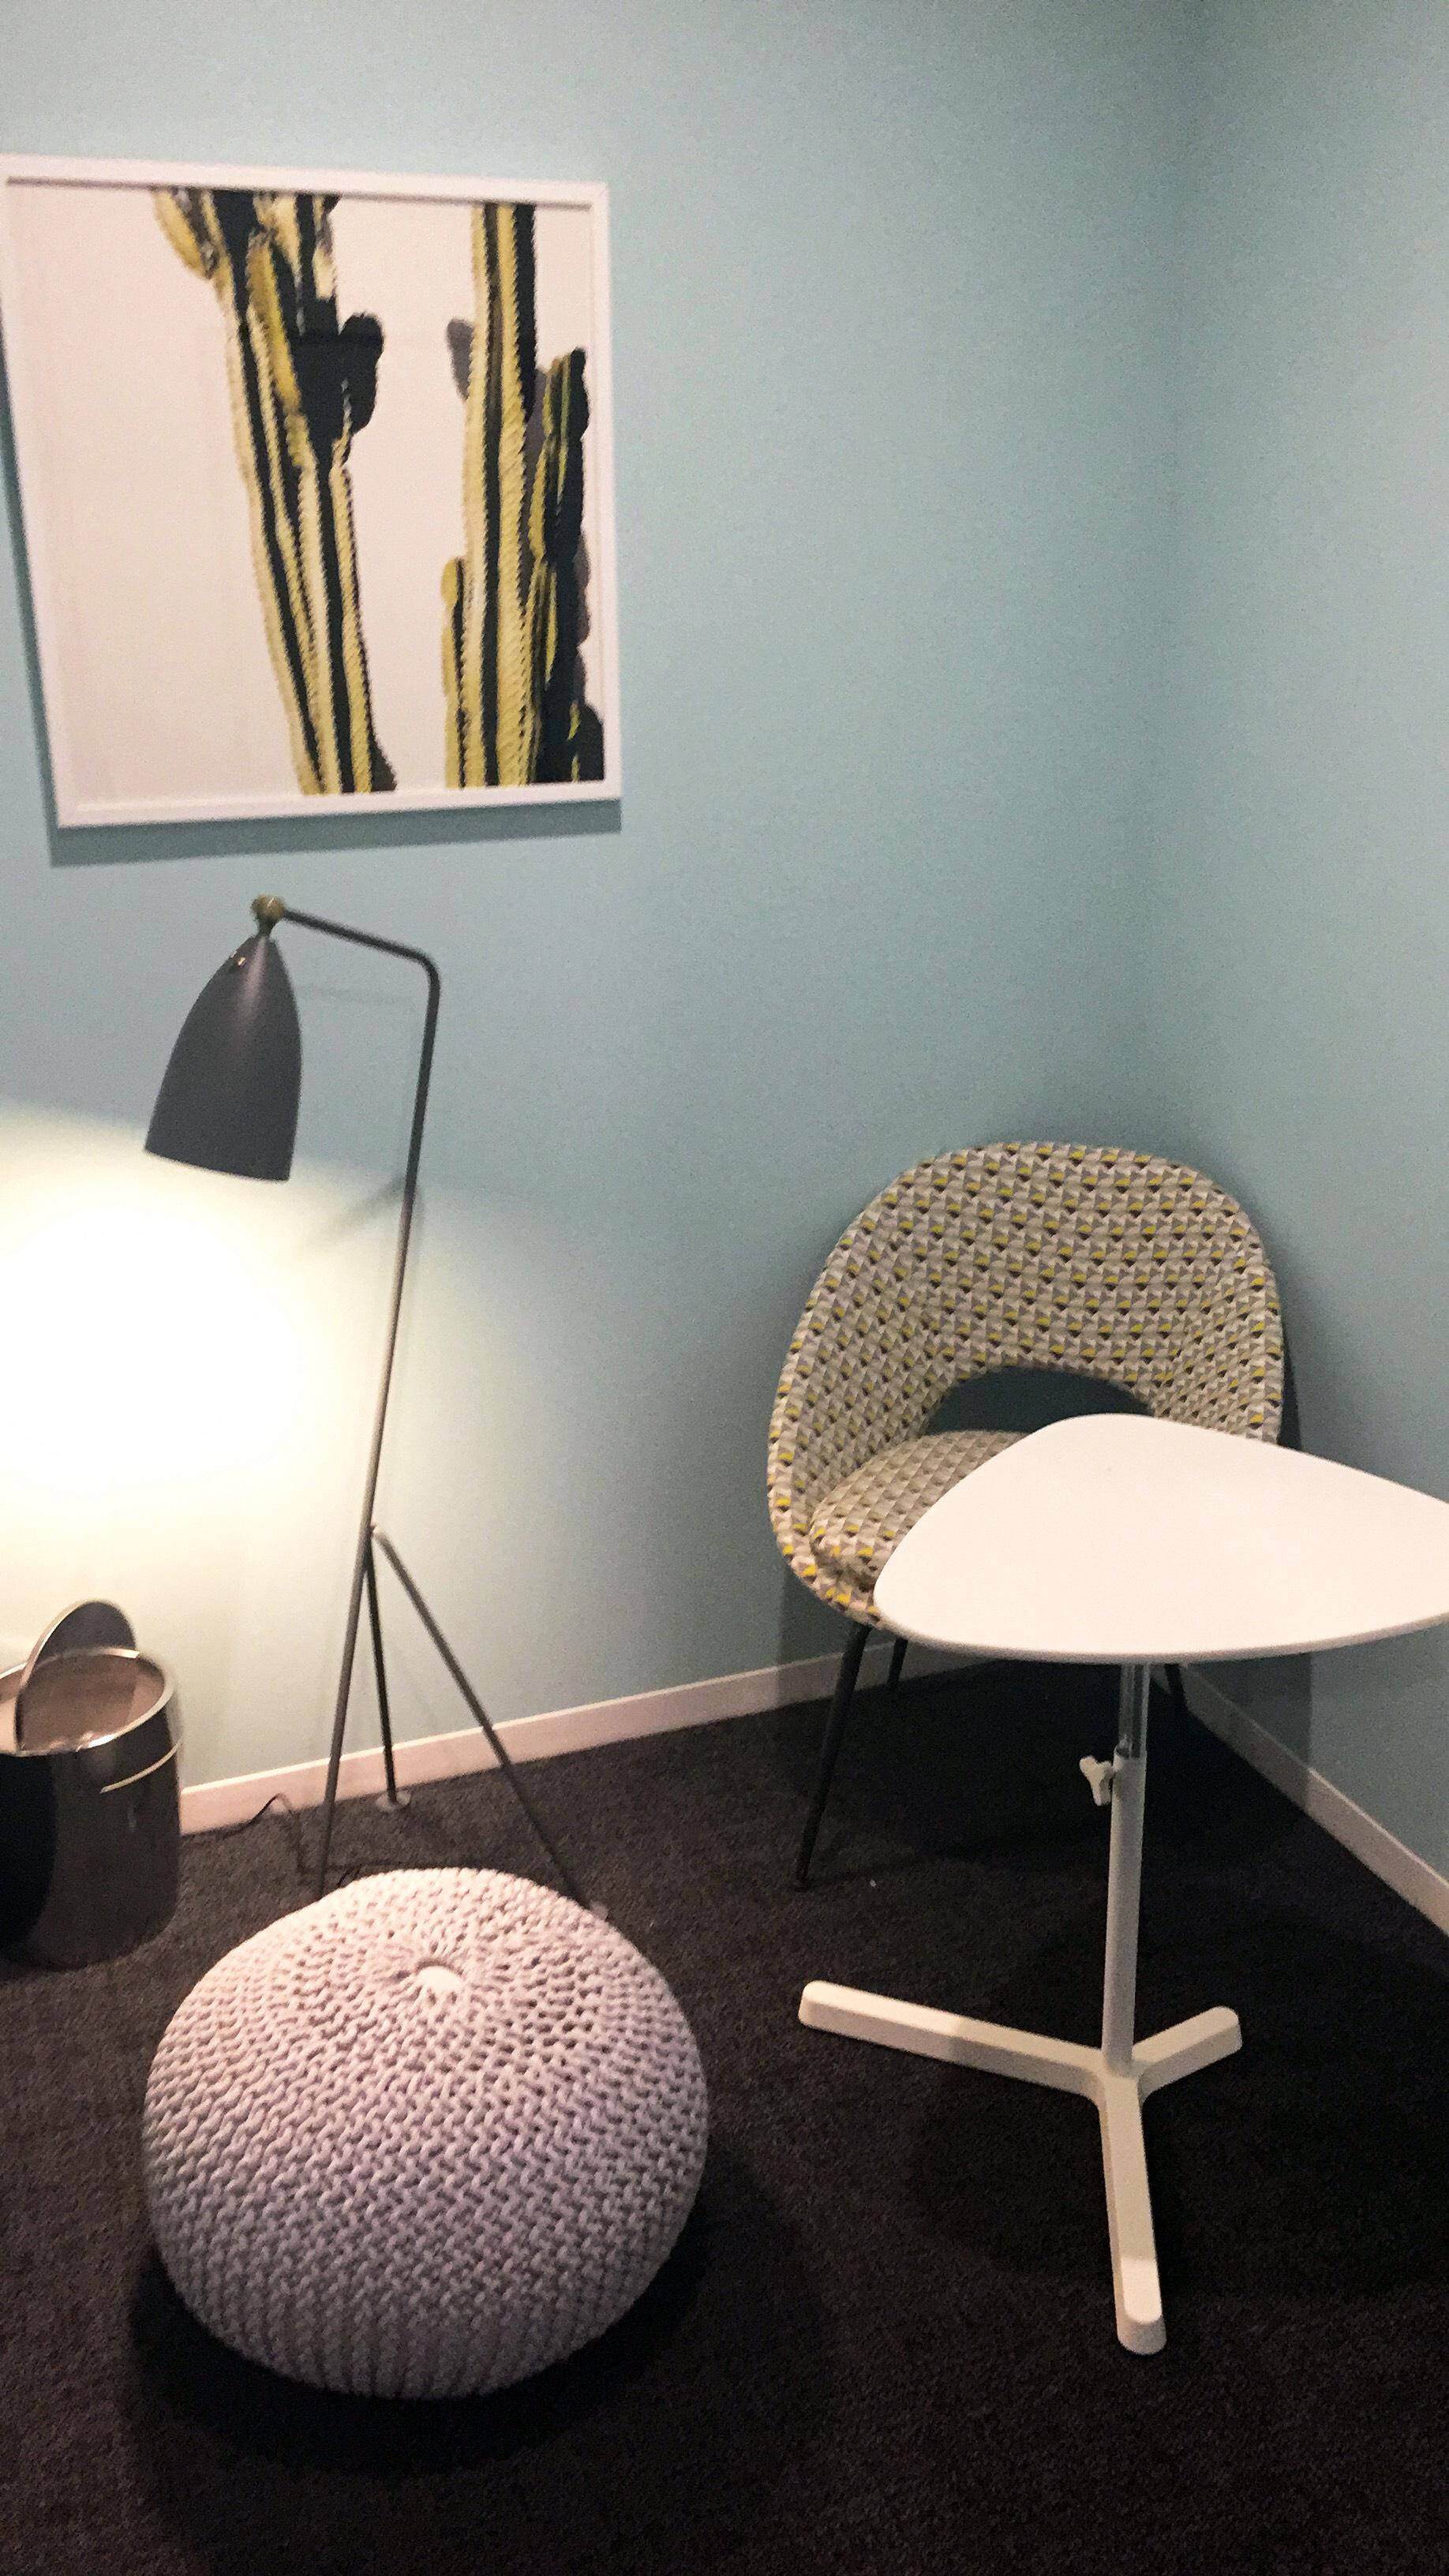 shortpump wellness room